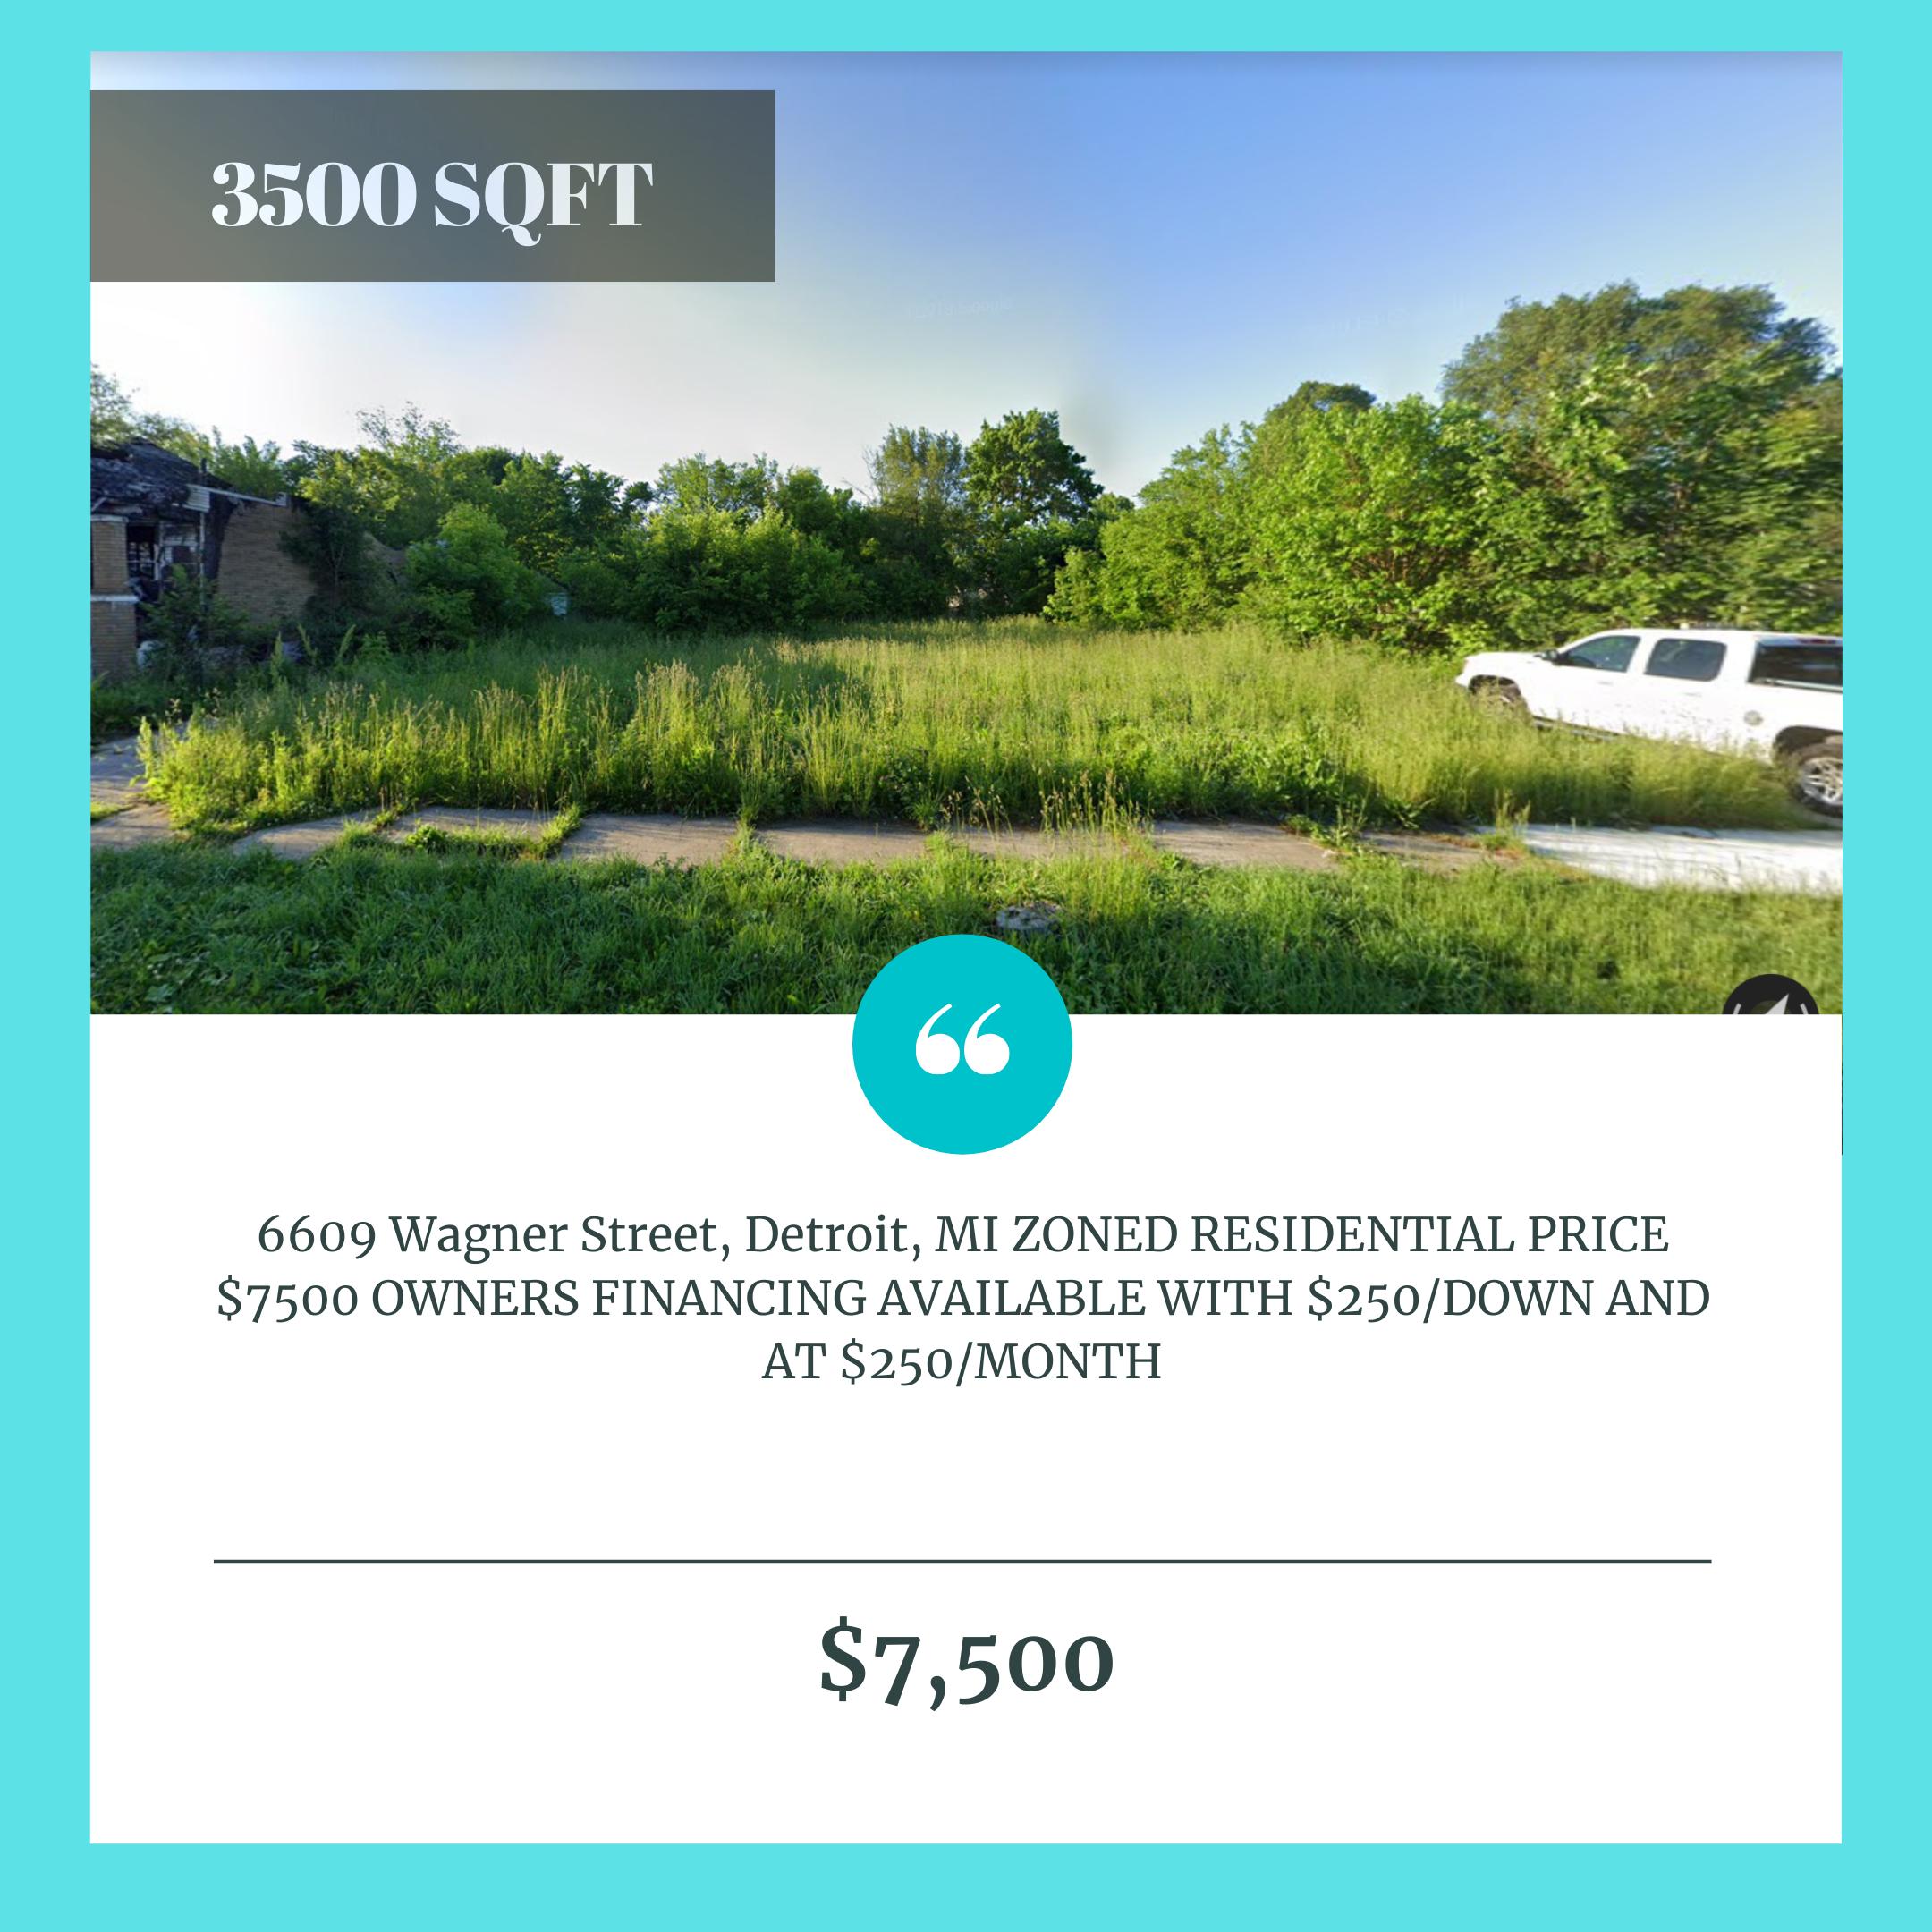 6609 Wagner Street, Detroit, MI